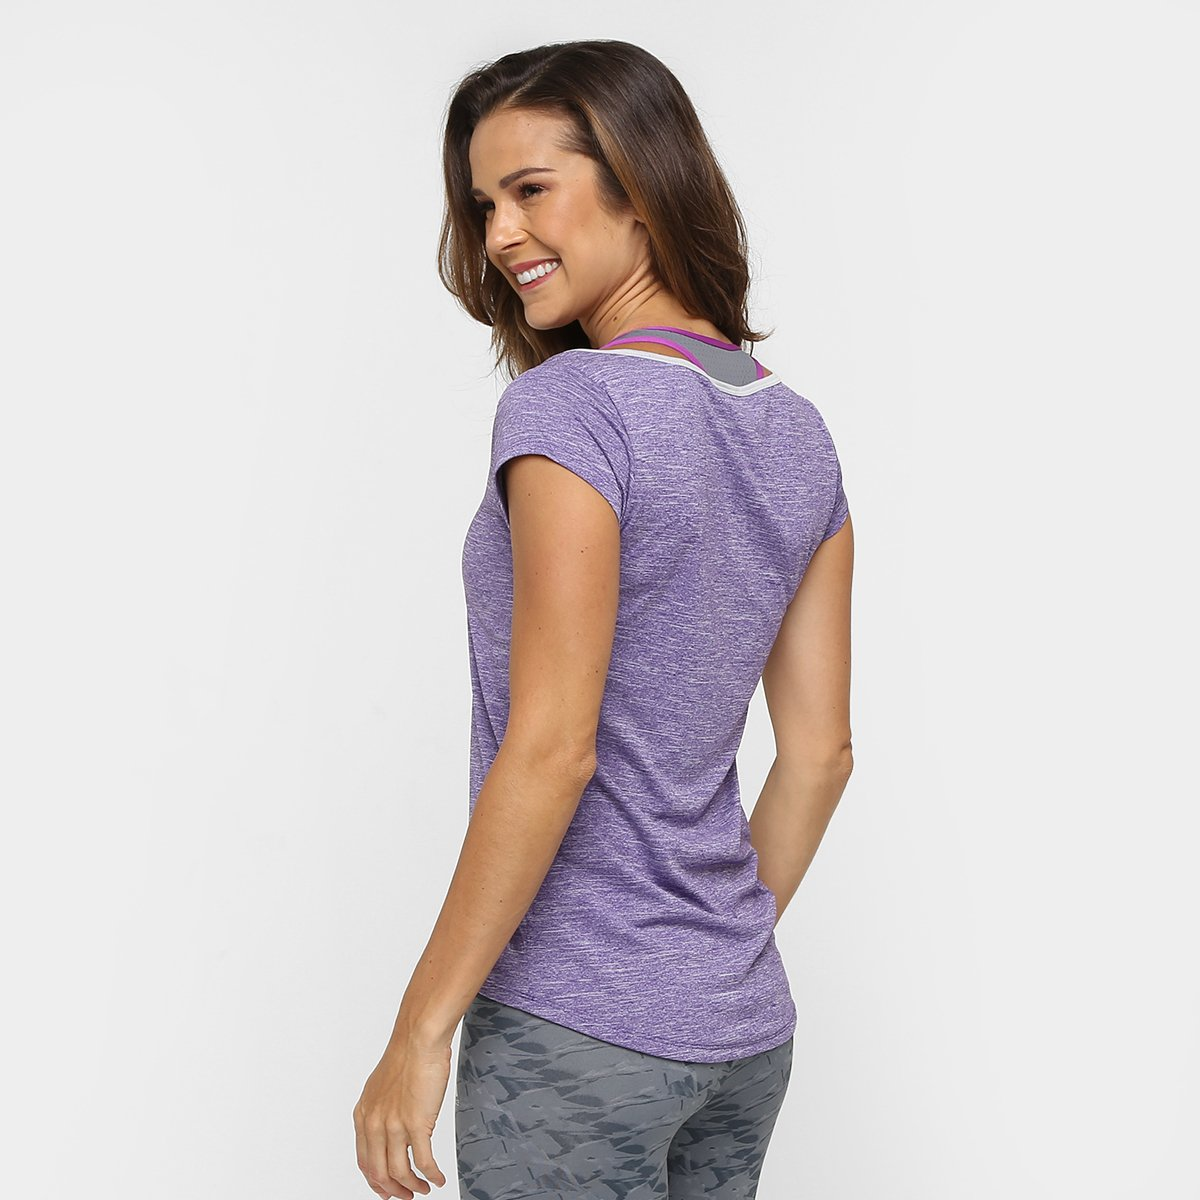 Ess Adidas Mescla Clima Camiseta Camiseta Feminina Adidas Roxo Ess q7WwZZ6I